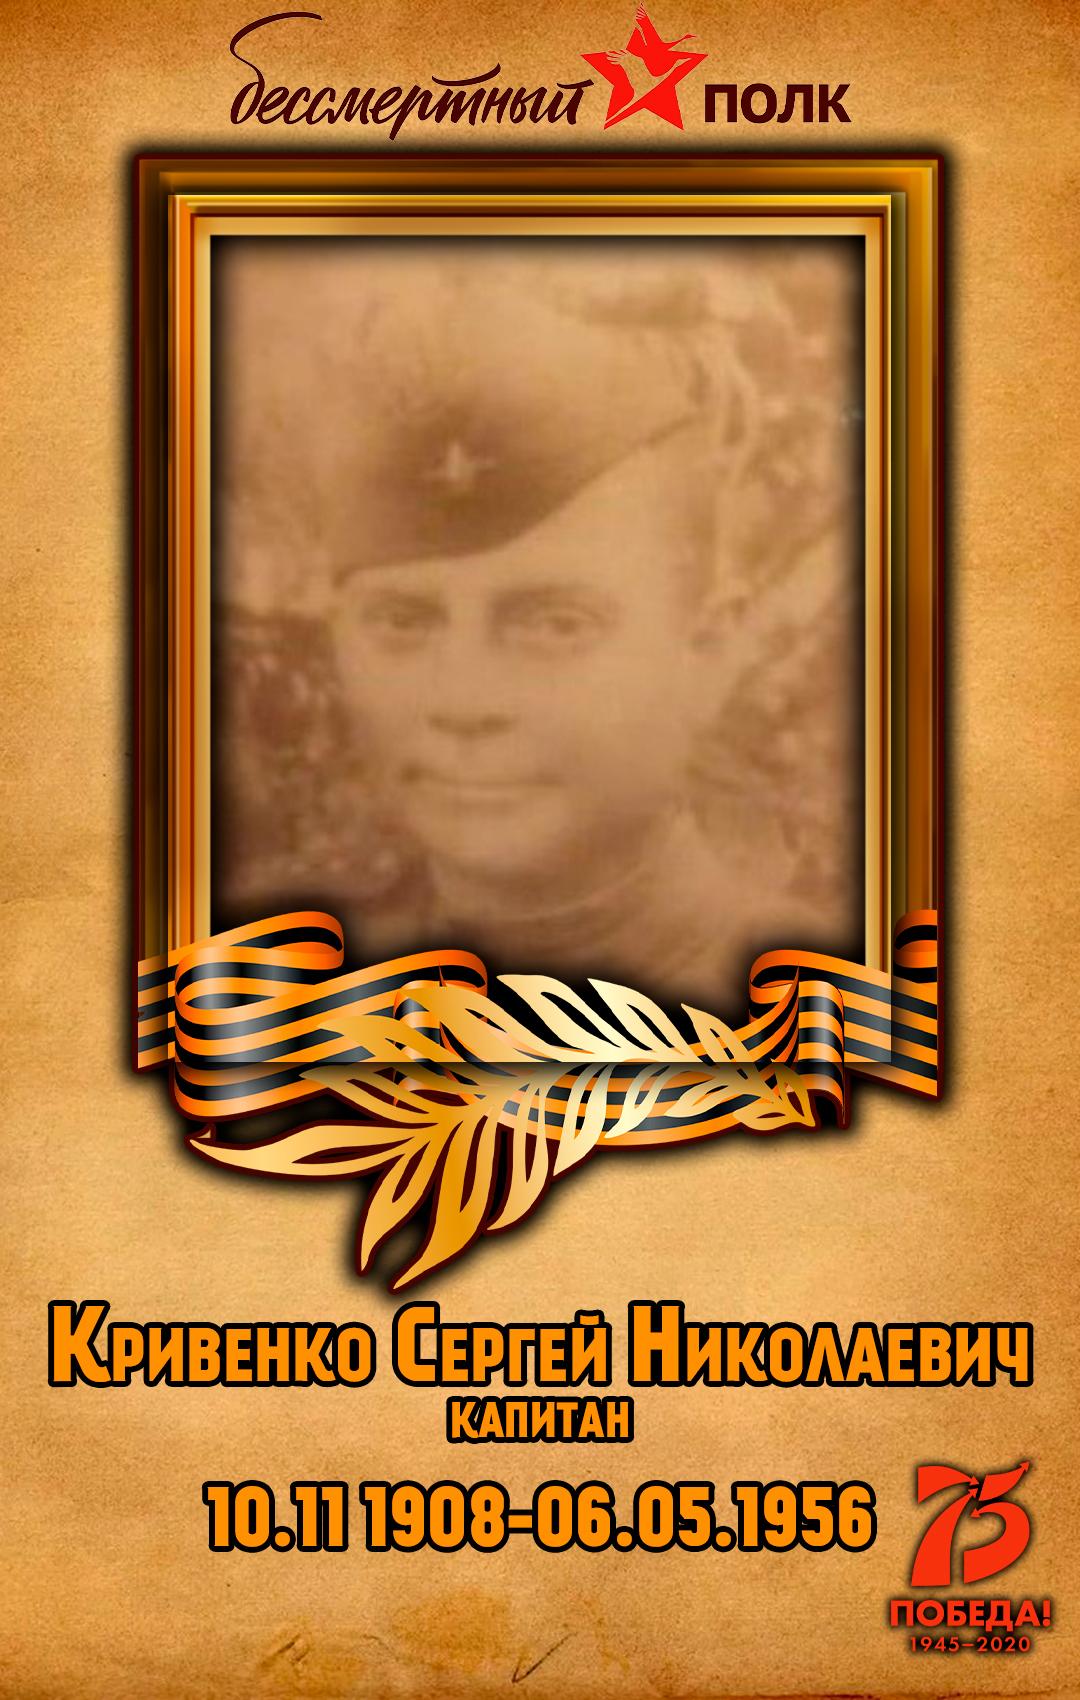 Кривенко-Сергей-Николаевич